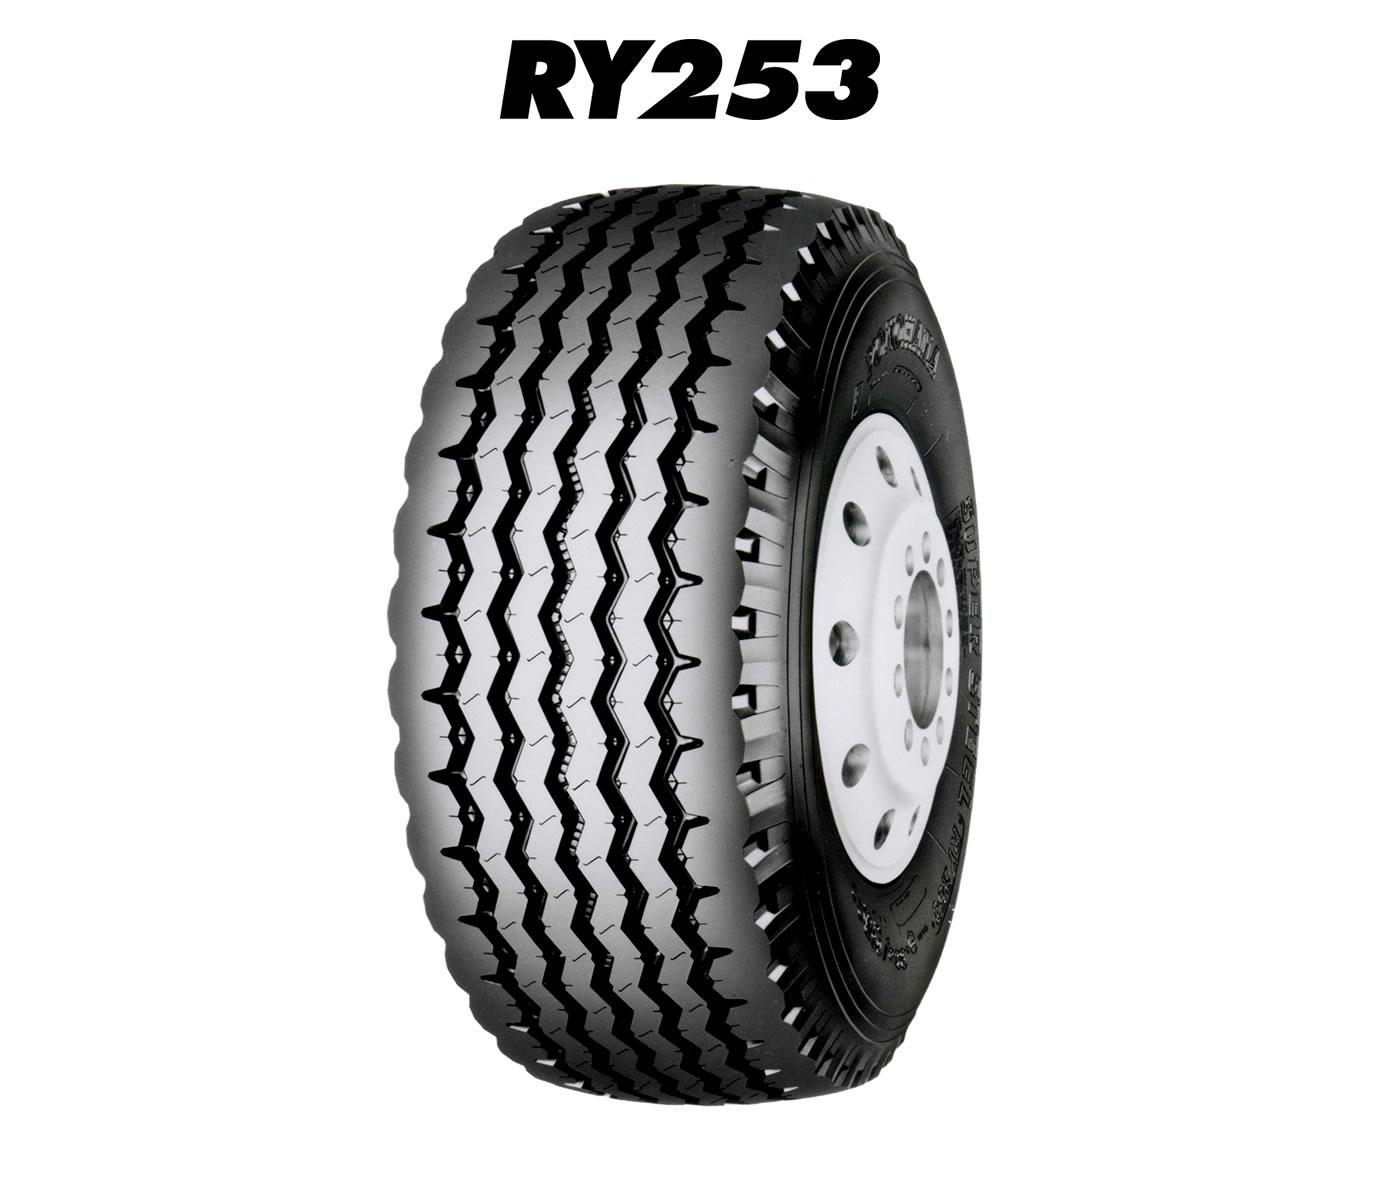 YOKOHAMA-42565-R-225-RY253-Tehergepkocsi-potkocsi-RY253-gumi